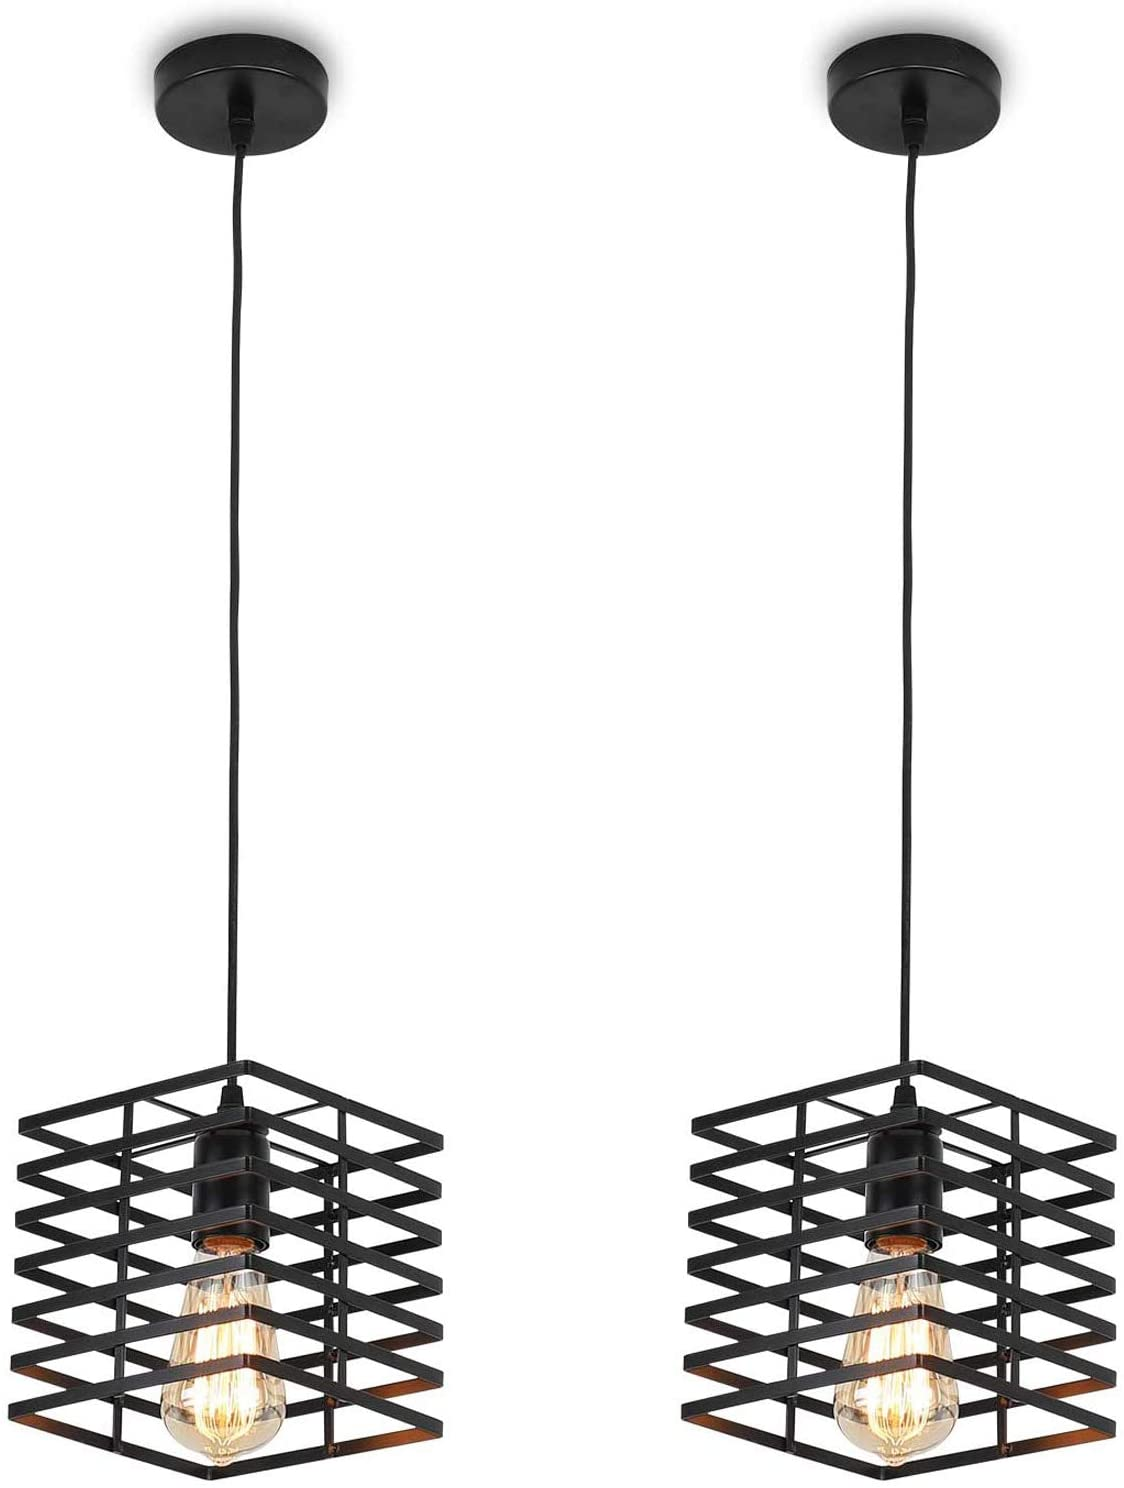 Farmhouse Pendant Light Set of 2, JOOSENLUX Edison Metal Black Pendant Lights Fixtures E26 Industrial Vintage Hanging Lamp for Kitchen Island Dinning Room Bedroom (Square)